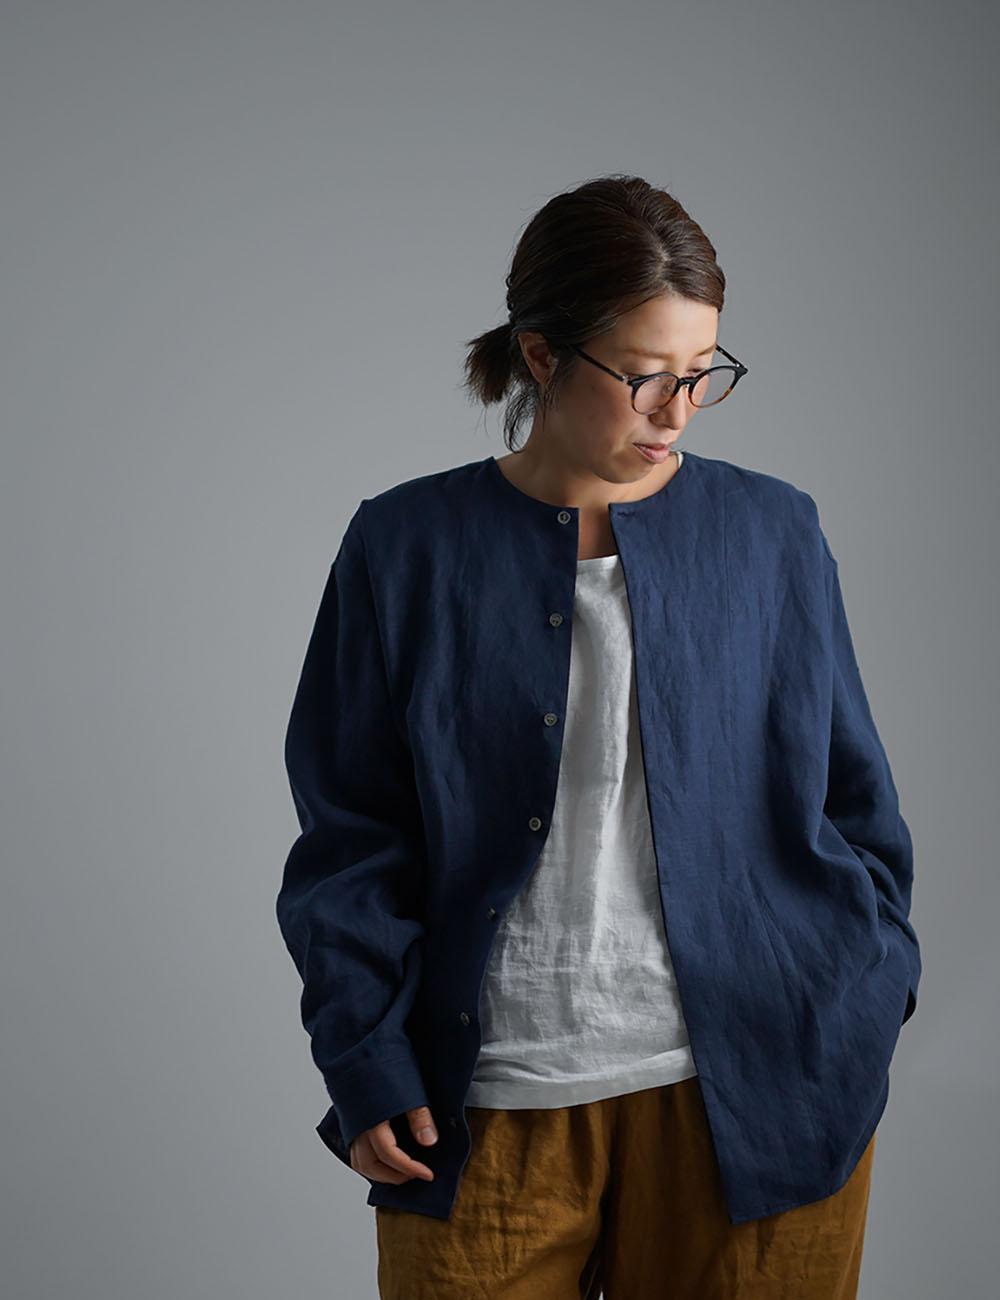 【wafu】Oversized Linen shirt 比翼ビックシャツ 男女兼用 / 留紺(とめこん) t021e-tmk1